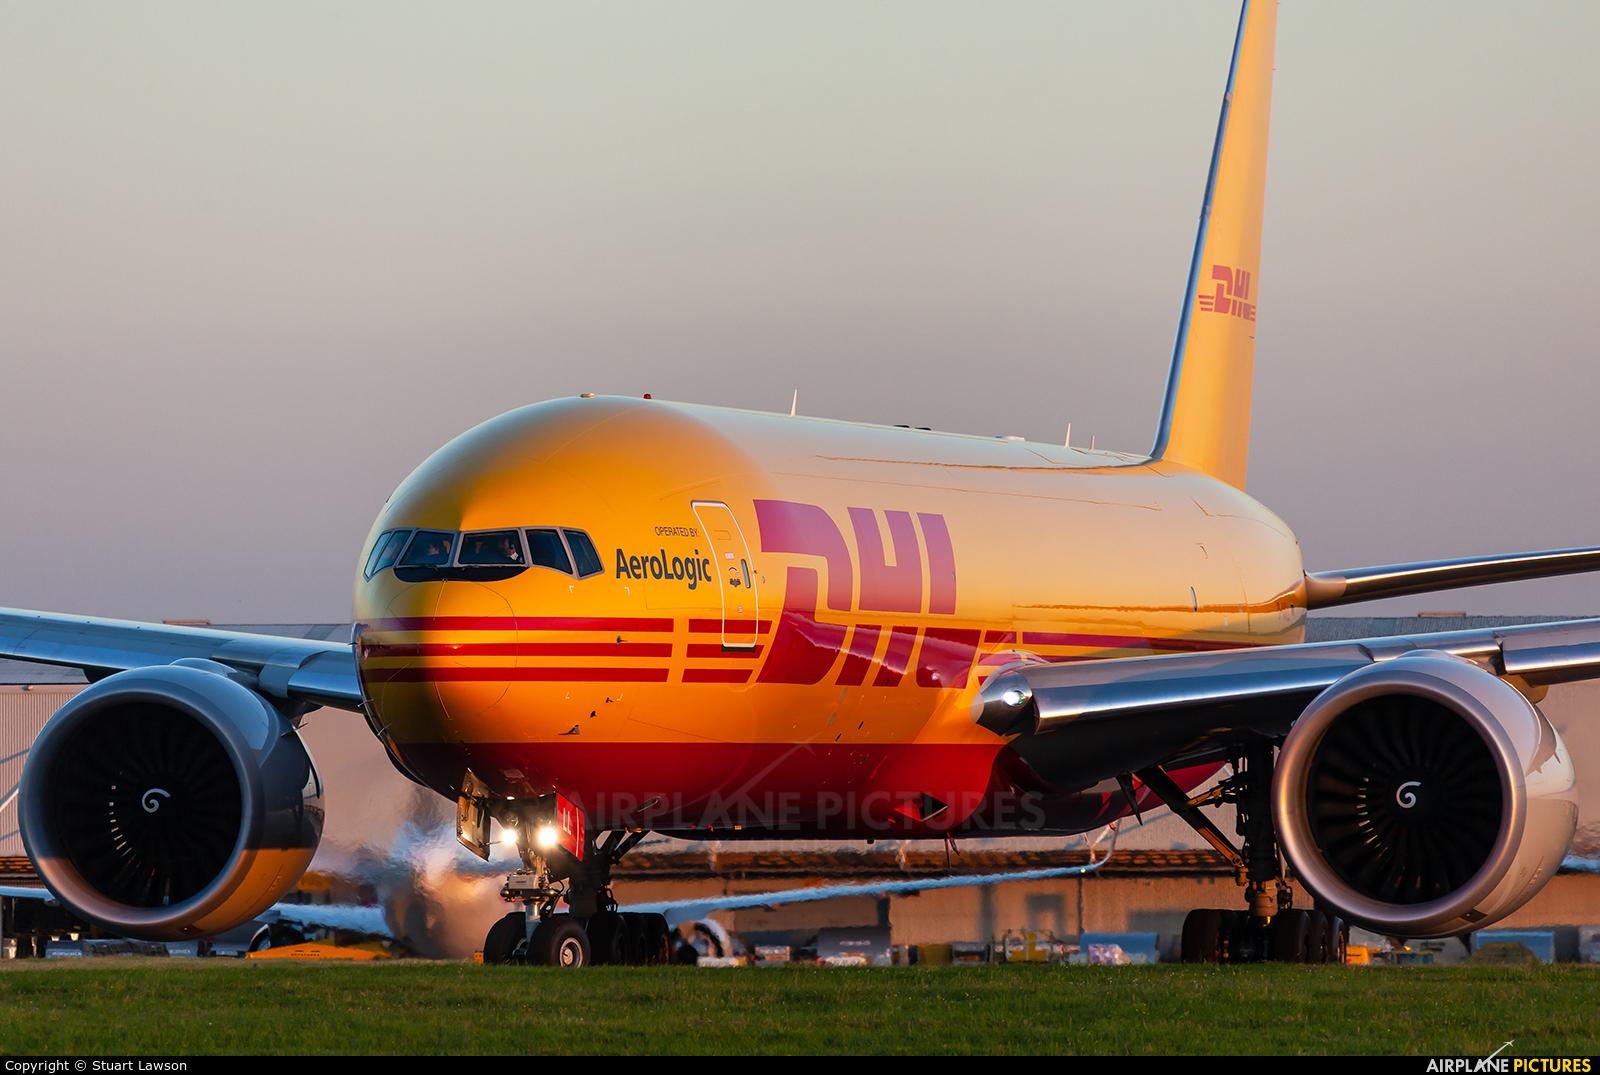 DHL (Aerologic) D-AALL aircraft at East Midlands